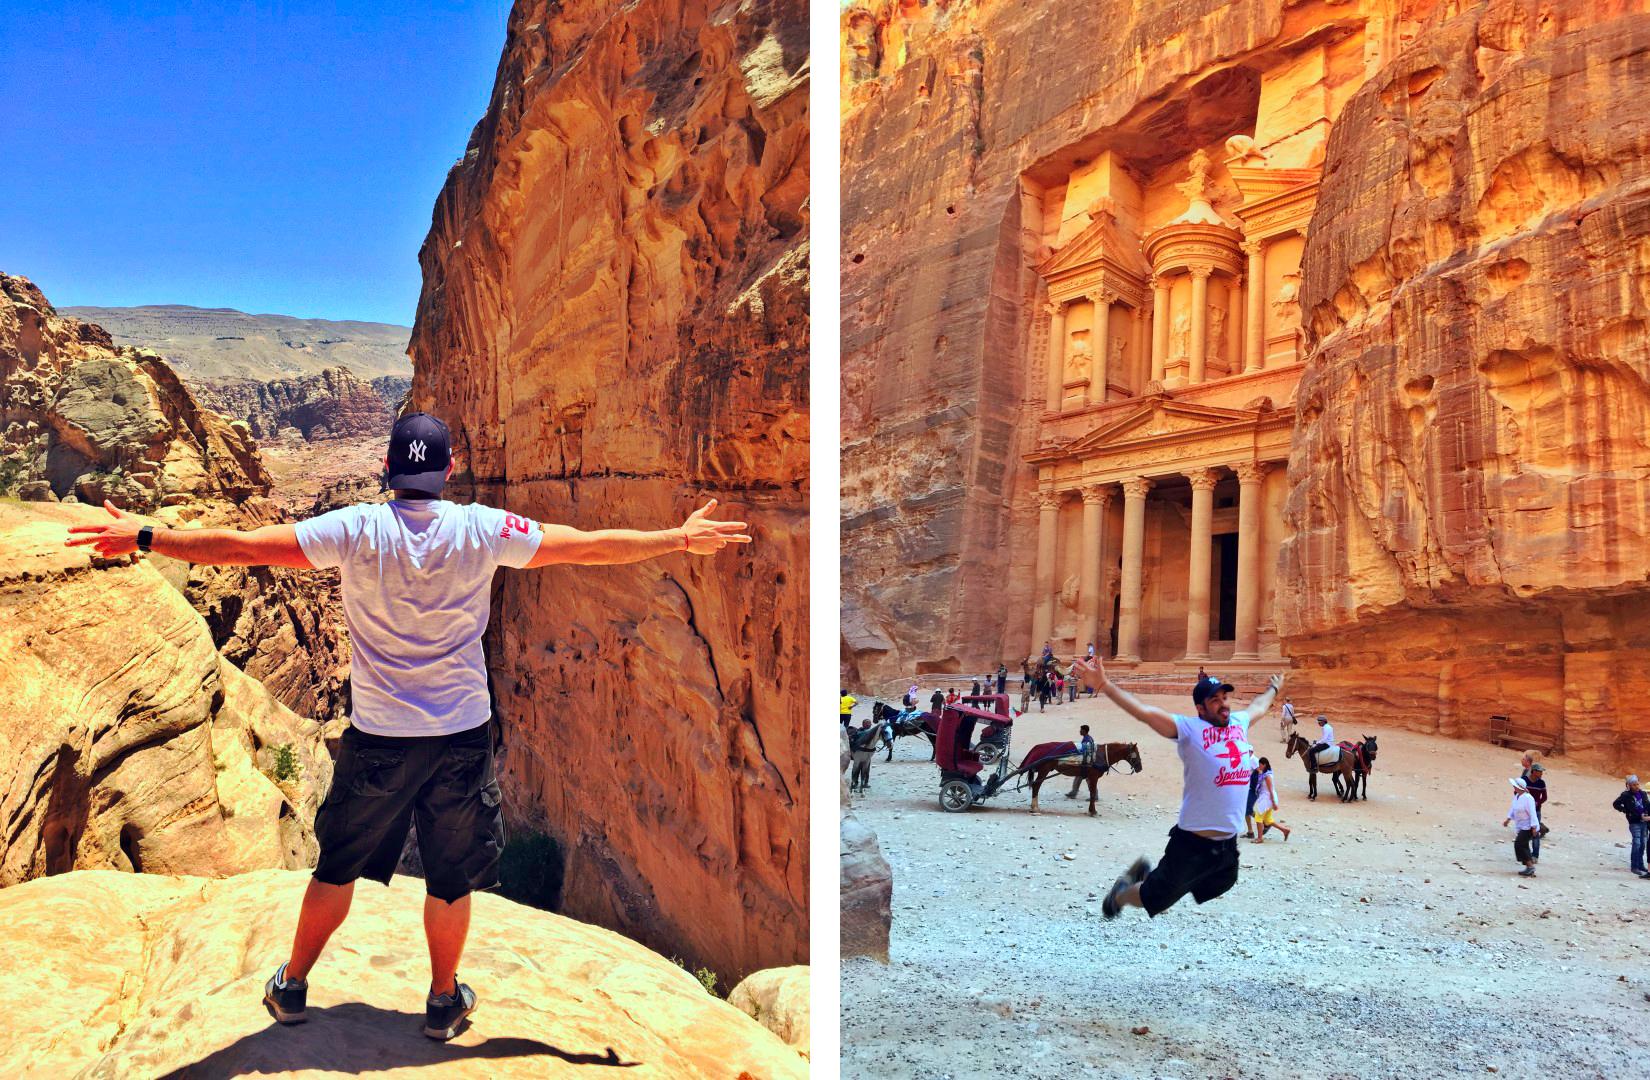 Viajar a Petra, Jordania petra, jordania - 28341488196 4807697eb0 o - Petra, Jordania